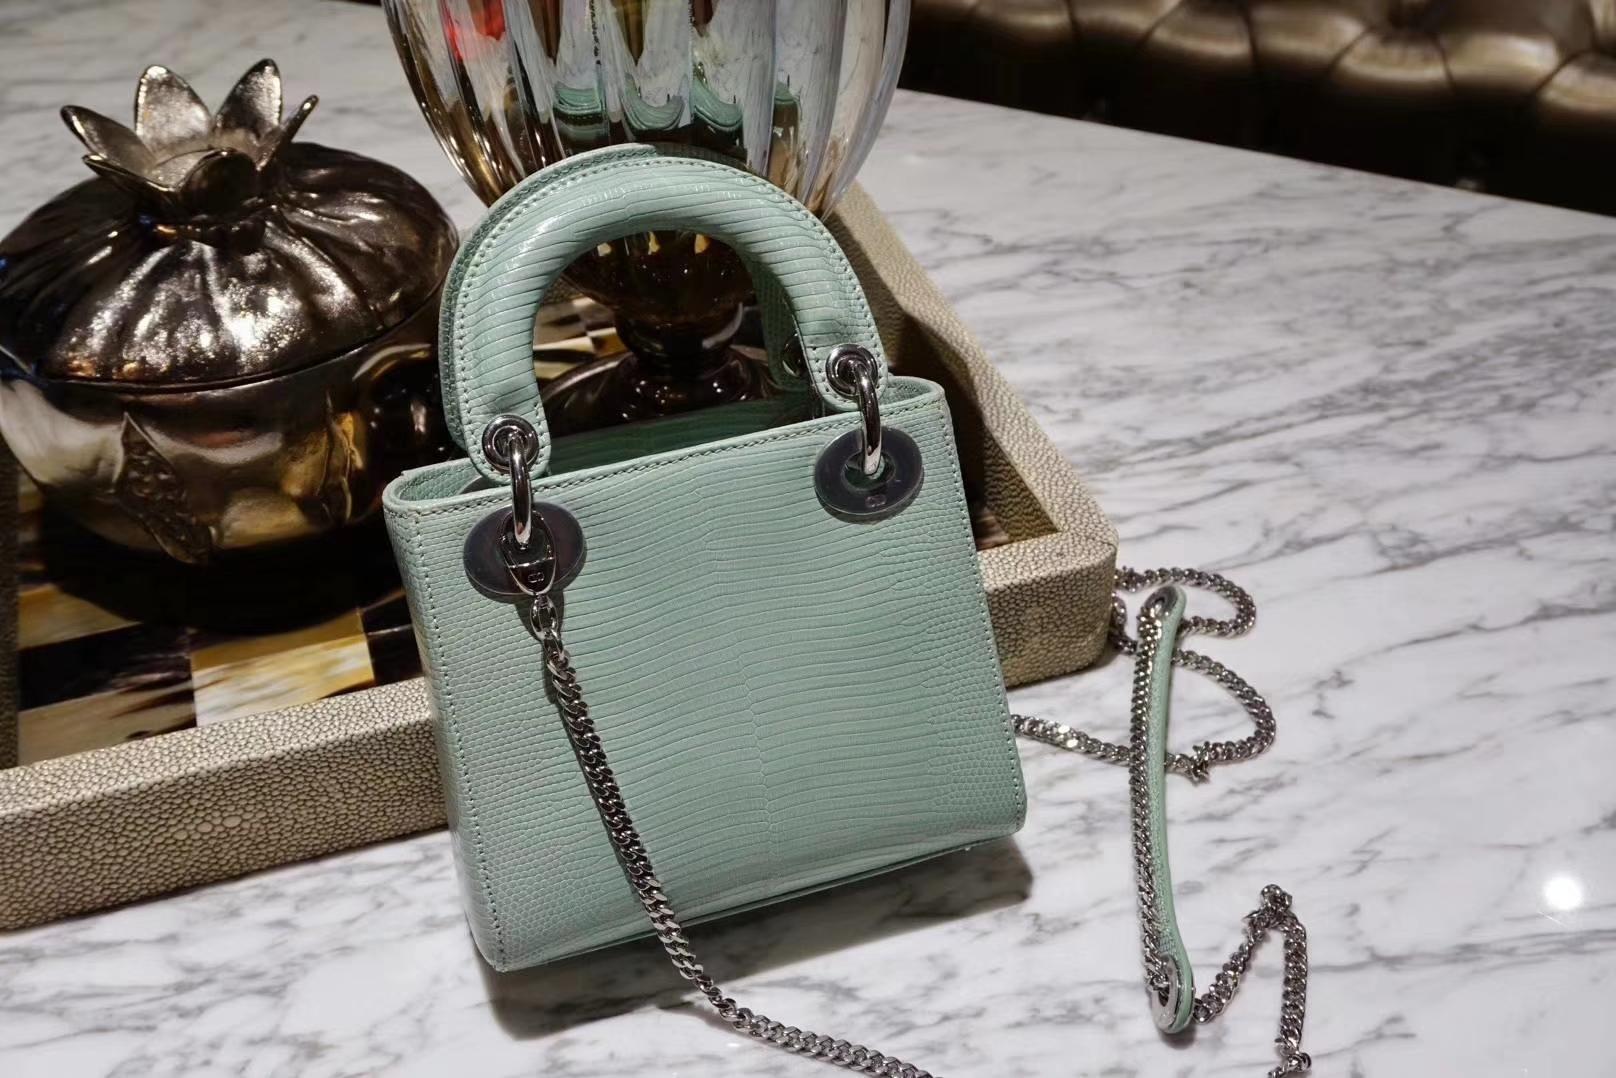 Dior mini 蜥蜴皮 完美出品 金扣 清新薄荷绿